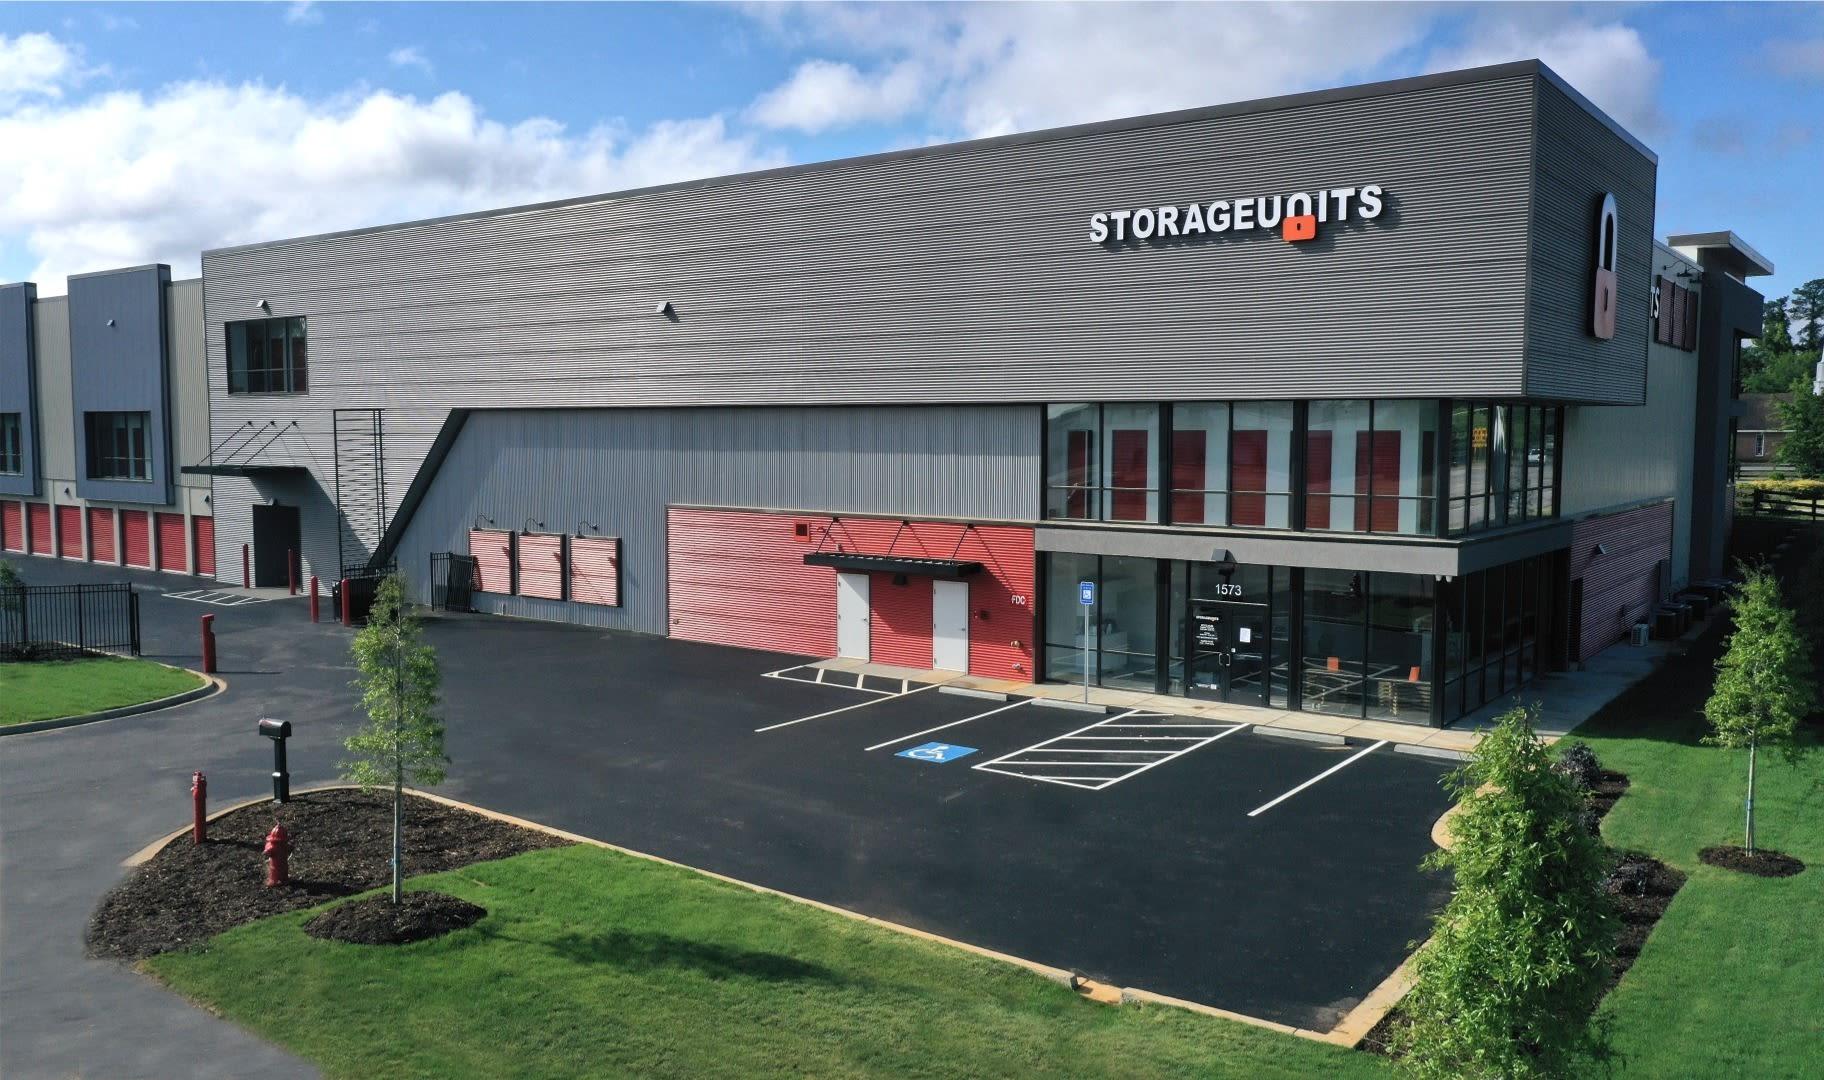 Main entrance to Storage Units in Aiken, South Carolina